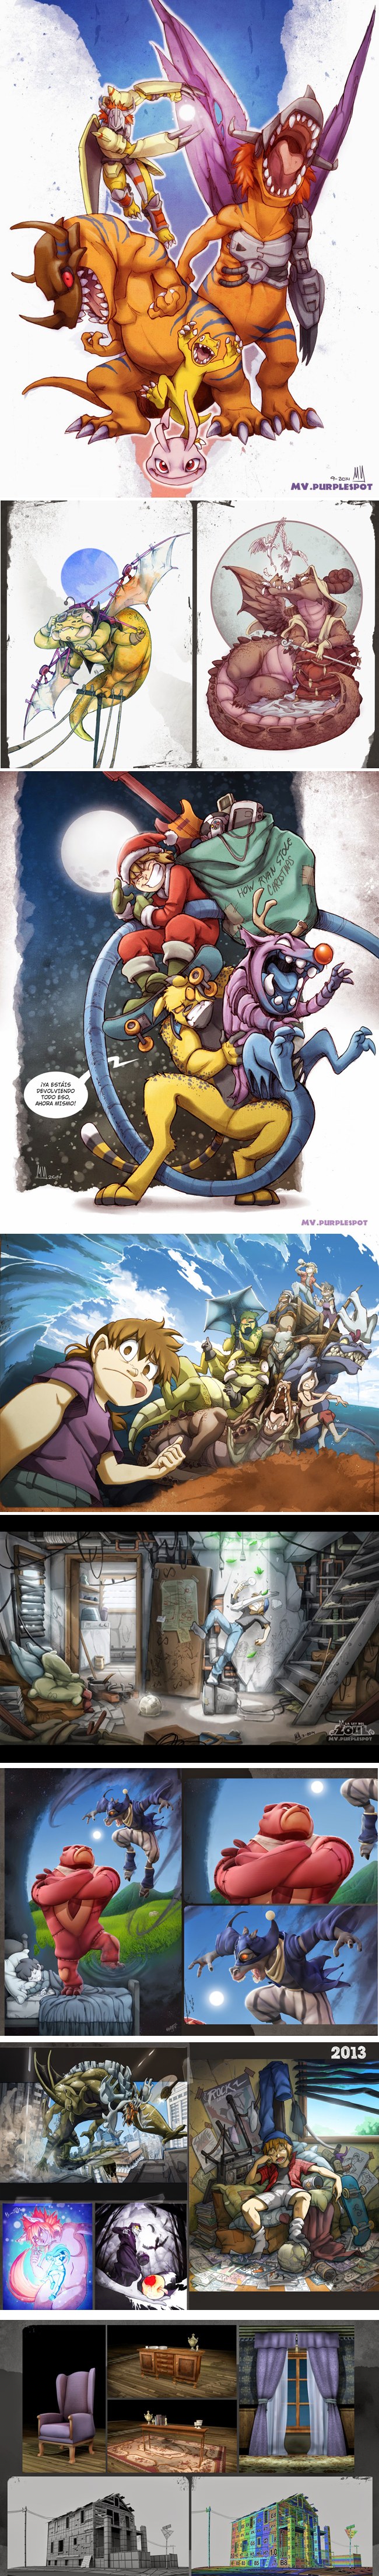 pastilla-curso-intensivo-verano-animacion-madrid-academiac10-ilustracion-dibujo-comic-manga